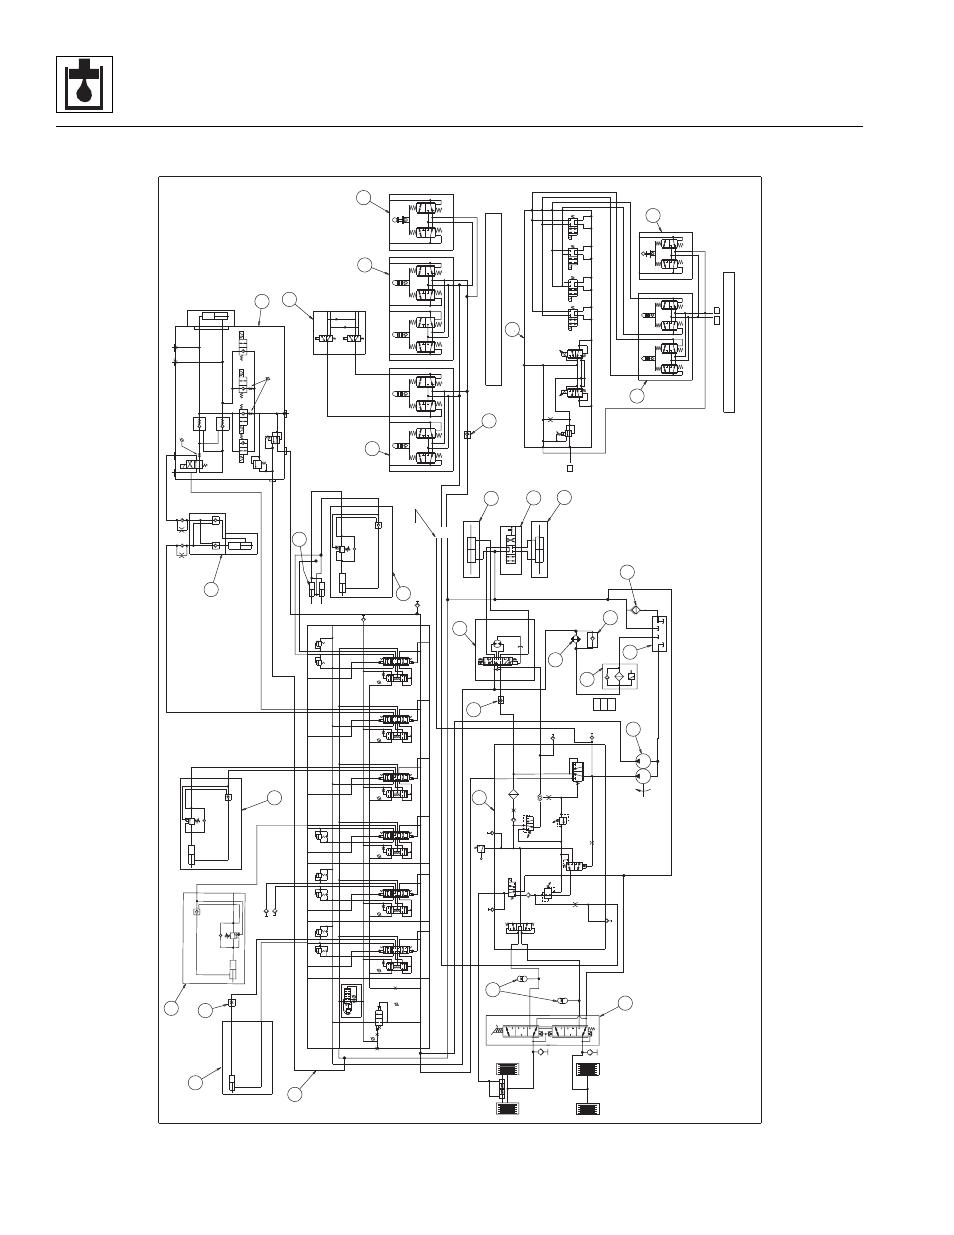 hight resolution of 2 hydraulic schematic 944e hydraulic schematic 944e hydraulic system mu7430b